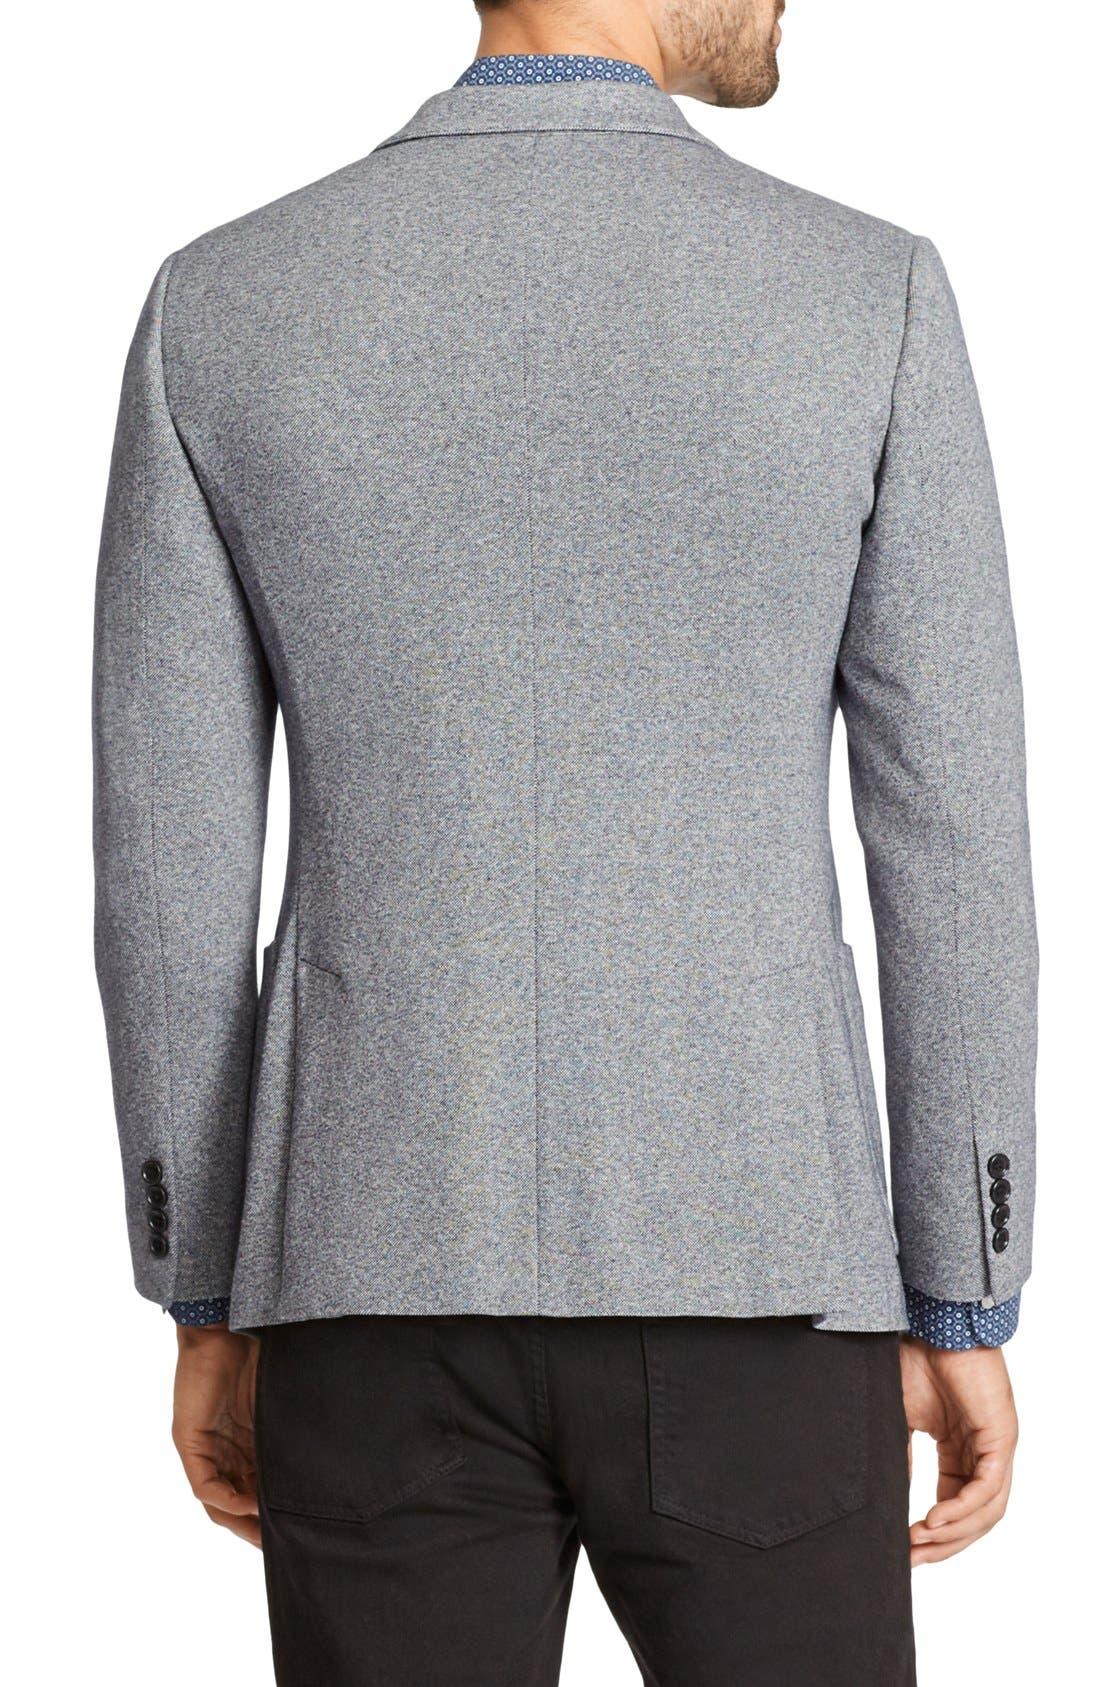 Jetsetter Trim Fit Knit Cotton Blazer,                             Alternate thumbnail 2, color,                             Light Grey